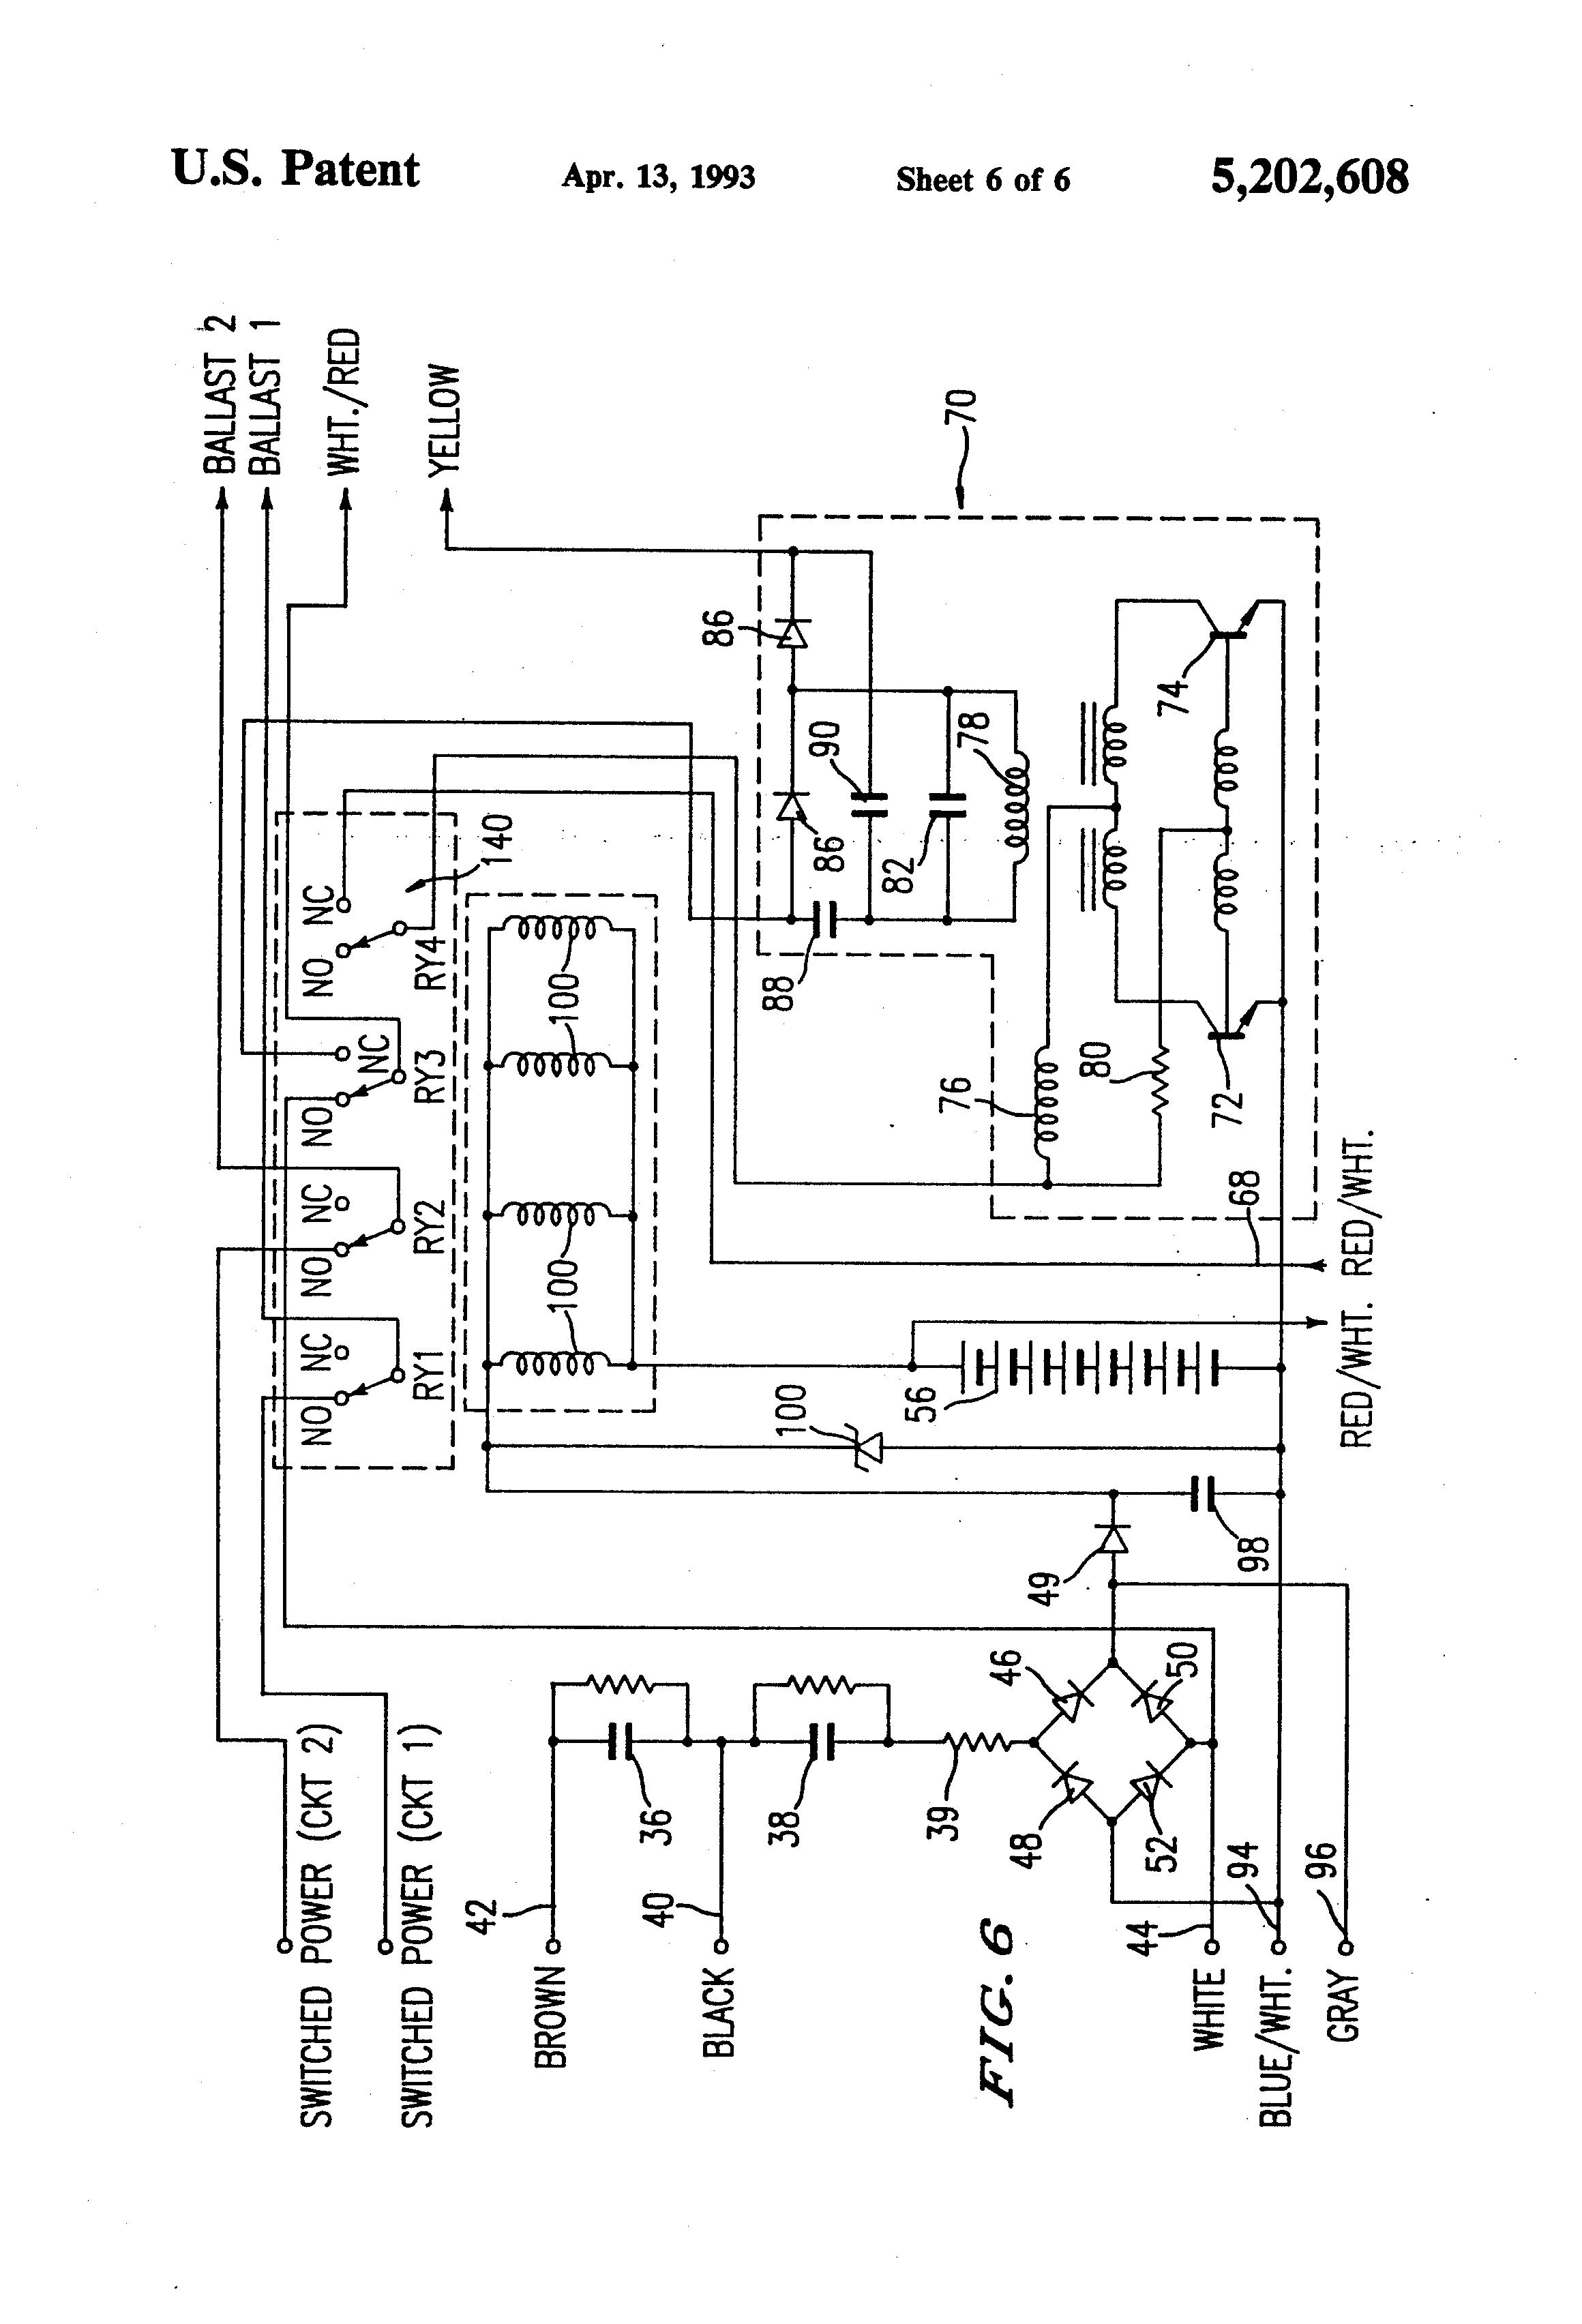 Philips Bodine B100 Wiring Diagram